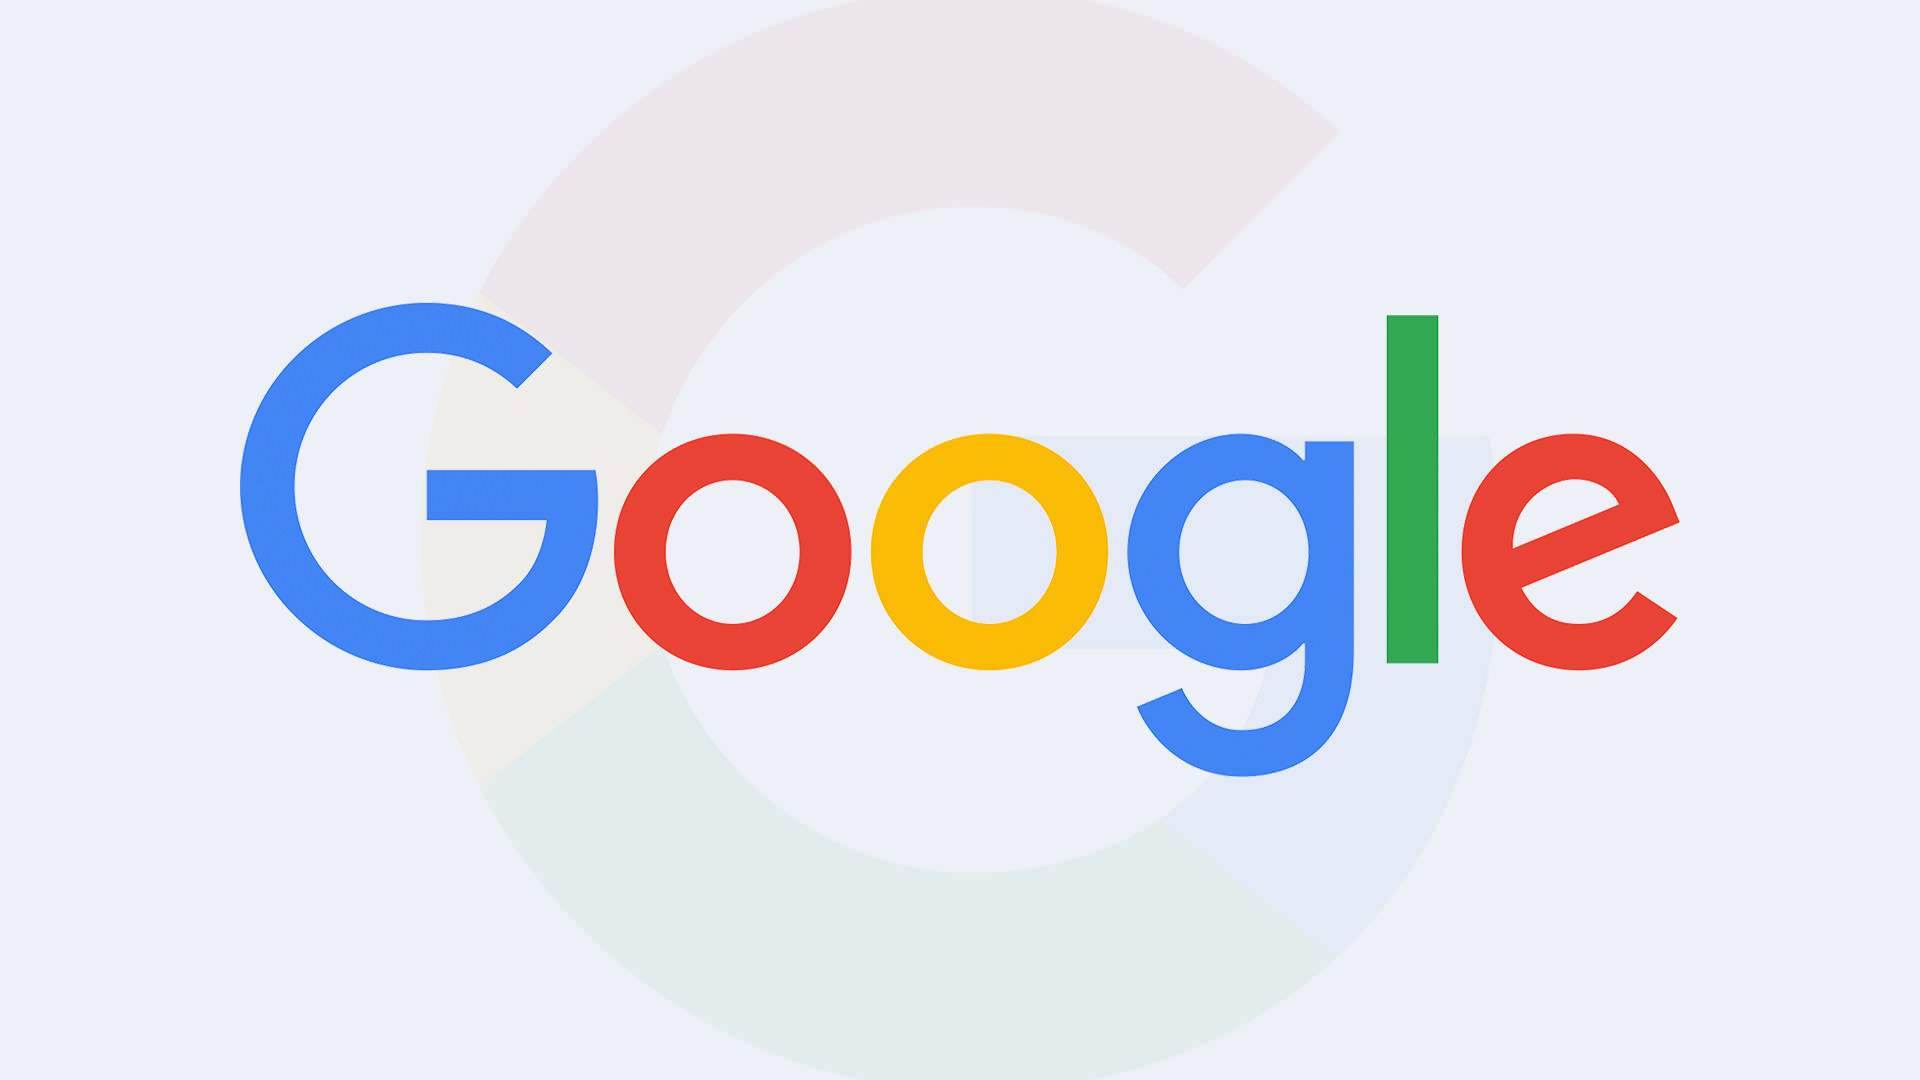 New google wallpaper 67 images 1920x1080 latest new google logo wallpaper voltagebd Gallery